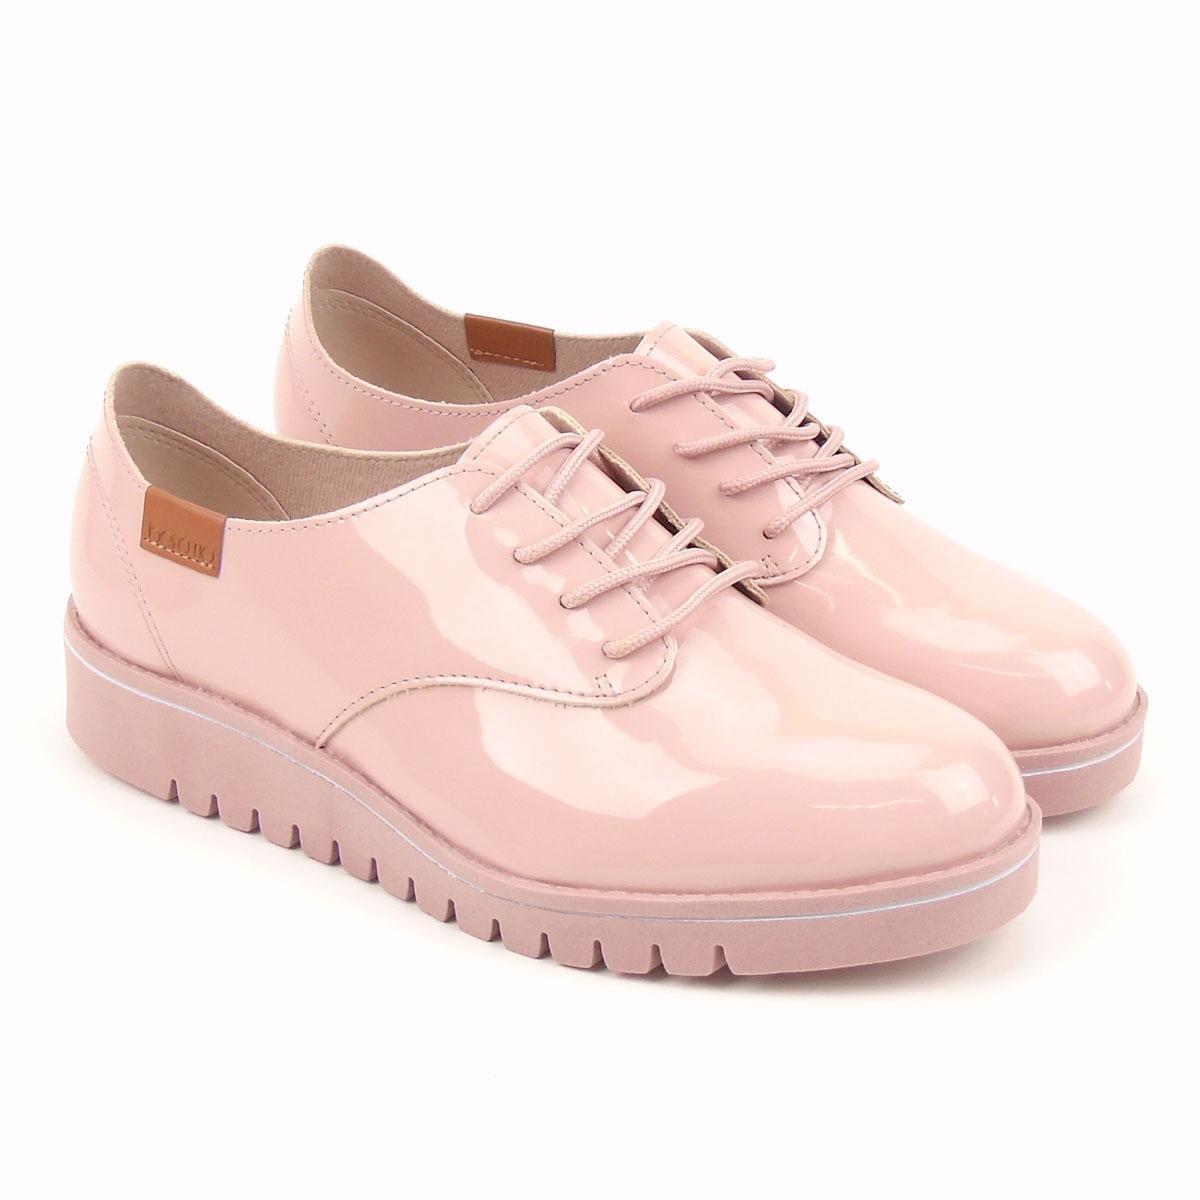 563316ea3 sapato oxford feminino 4174.101 rosa beira rio flatform. Carregando zoom.